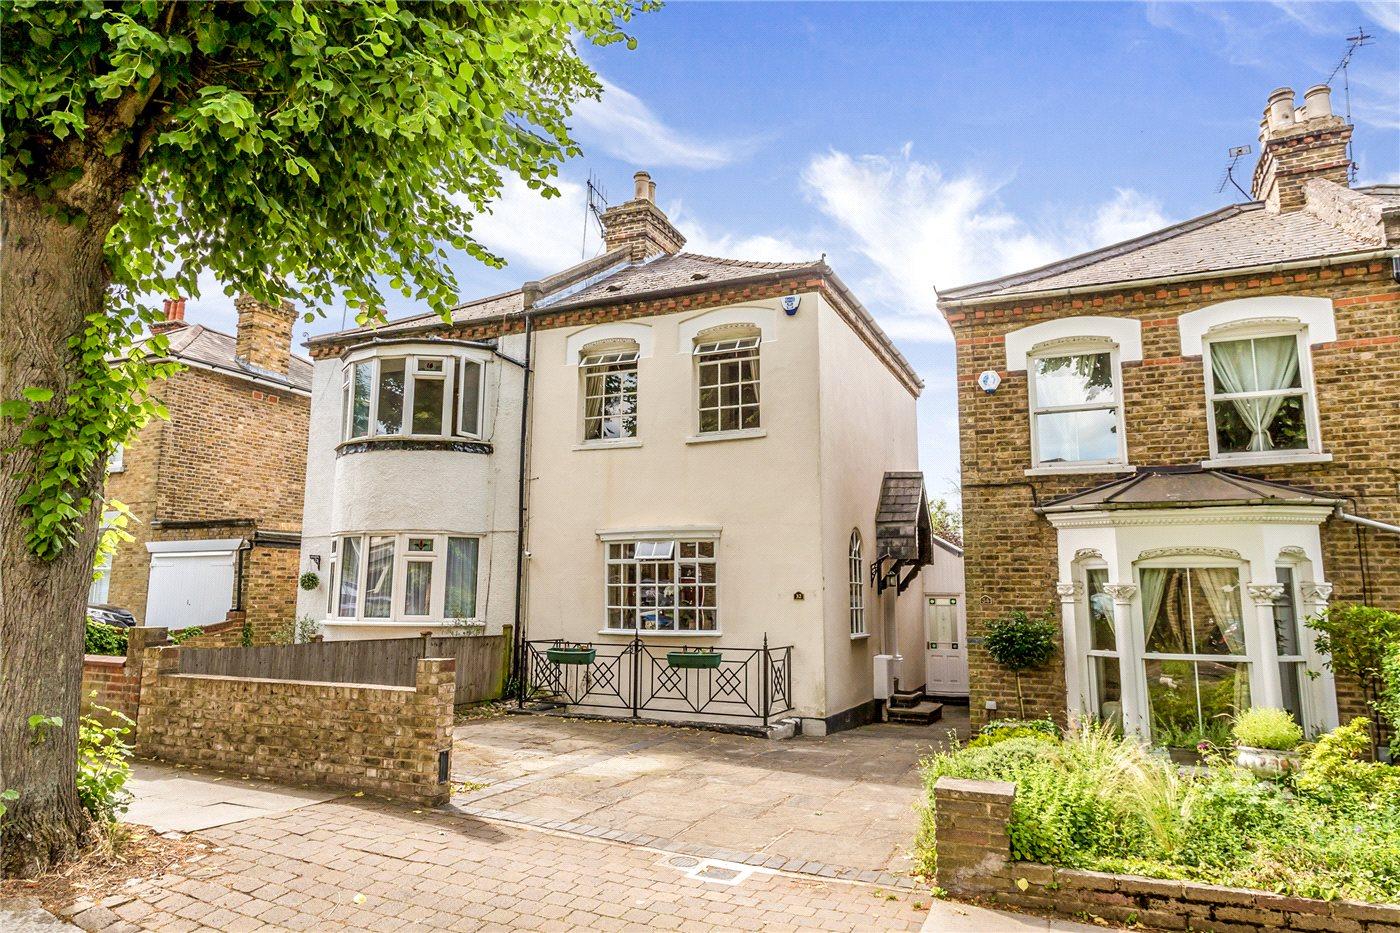 4 Bedrooms Semi Detached House for sale in Essex Road, Enfield, EN2